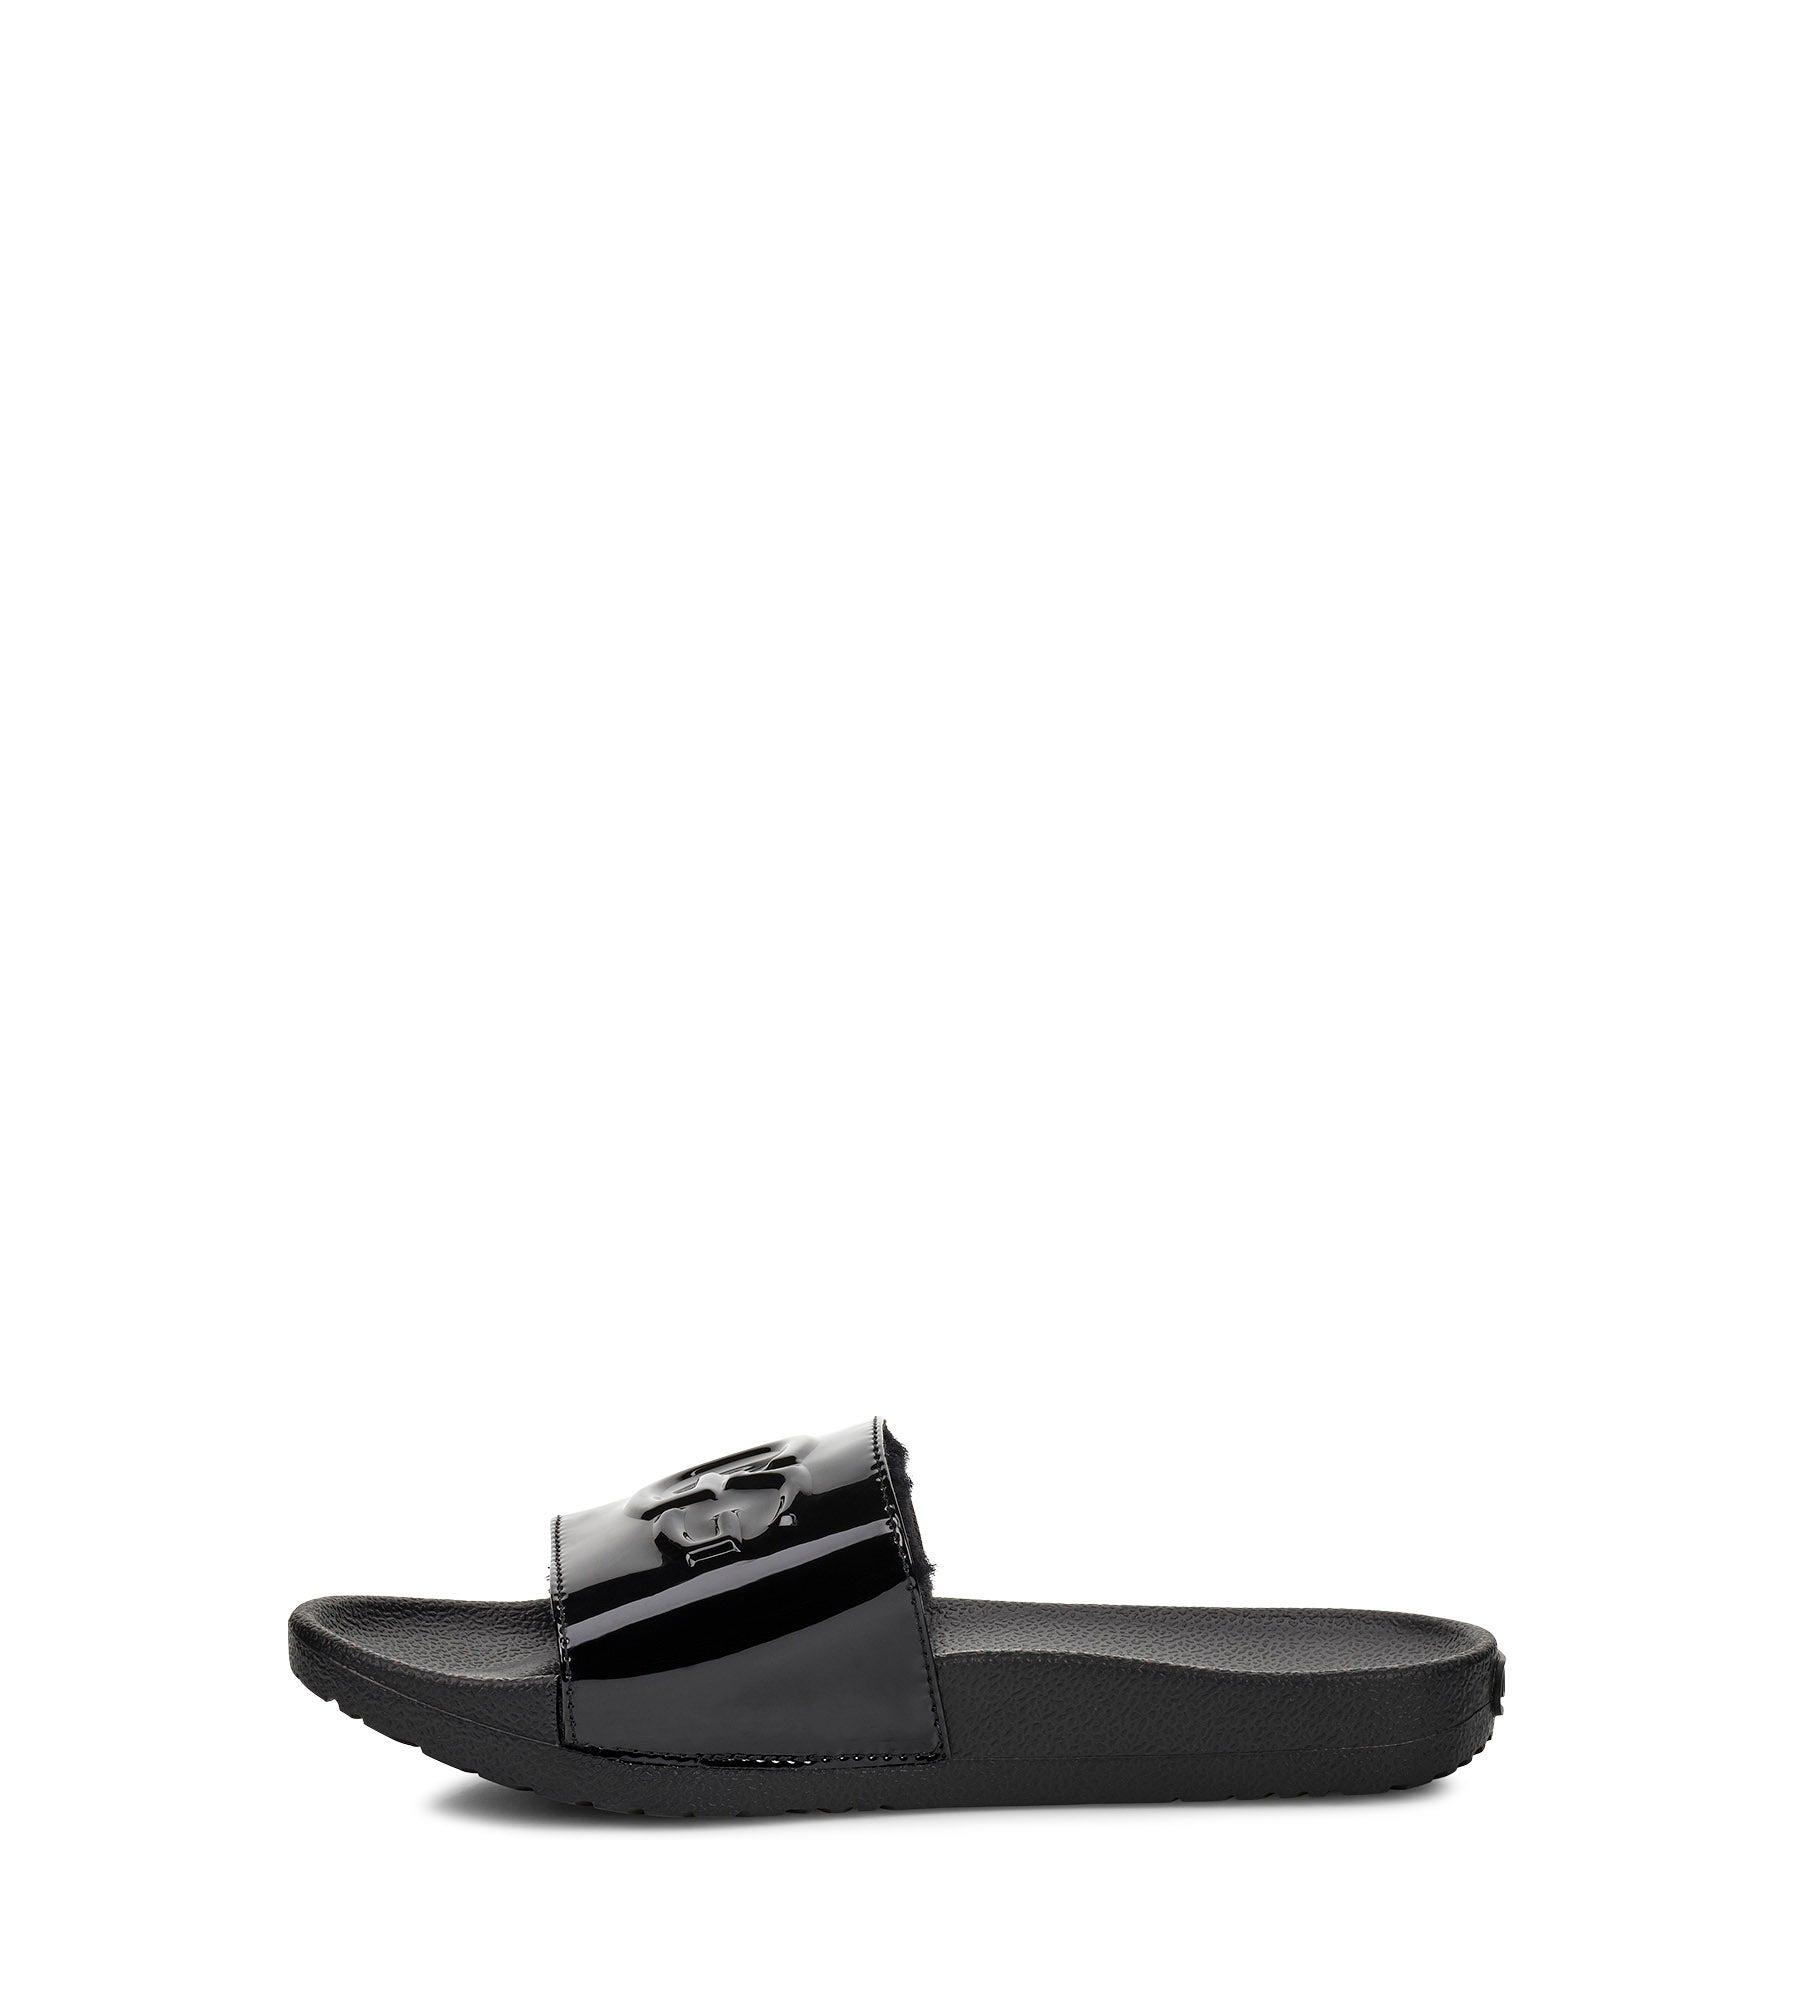 Lds Royale Graphic Metallic blk sandal